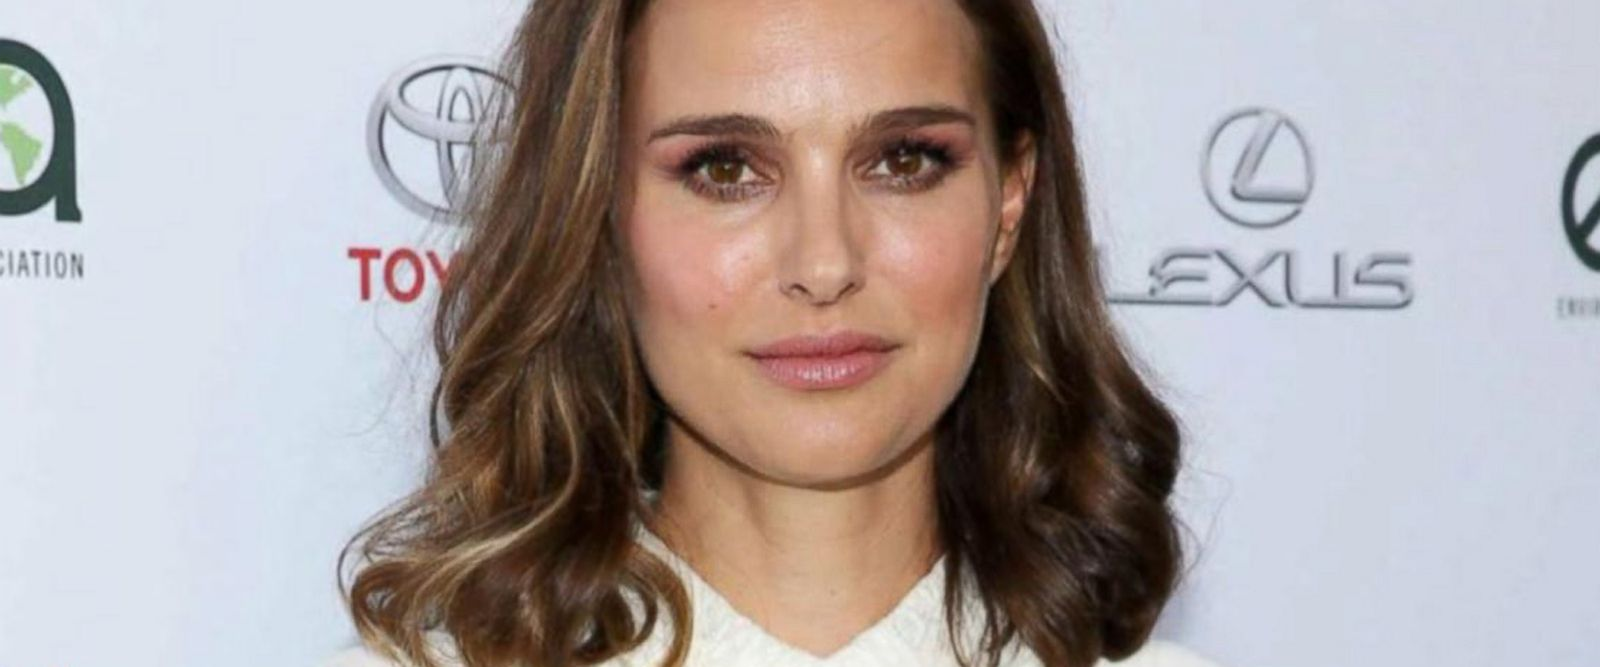 VIDEO: 'Start Here' podcast: Natalie Portman declines award, blames Benjamin Netanyahu